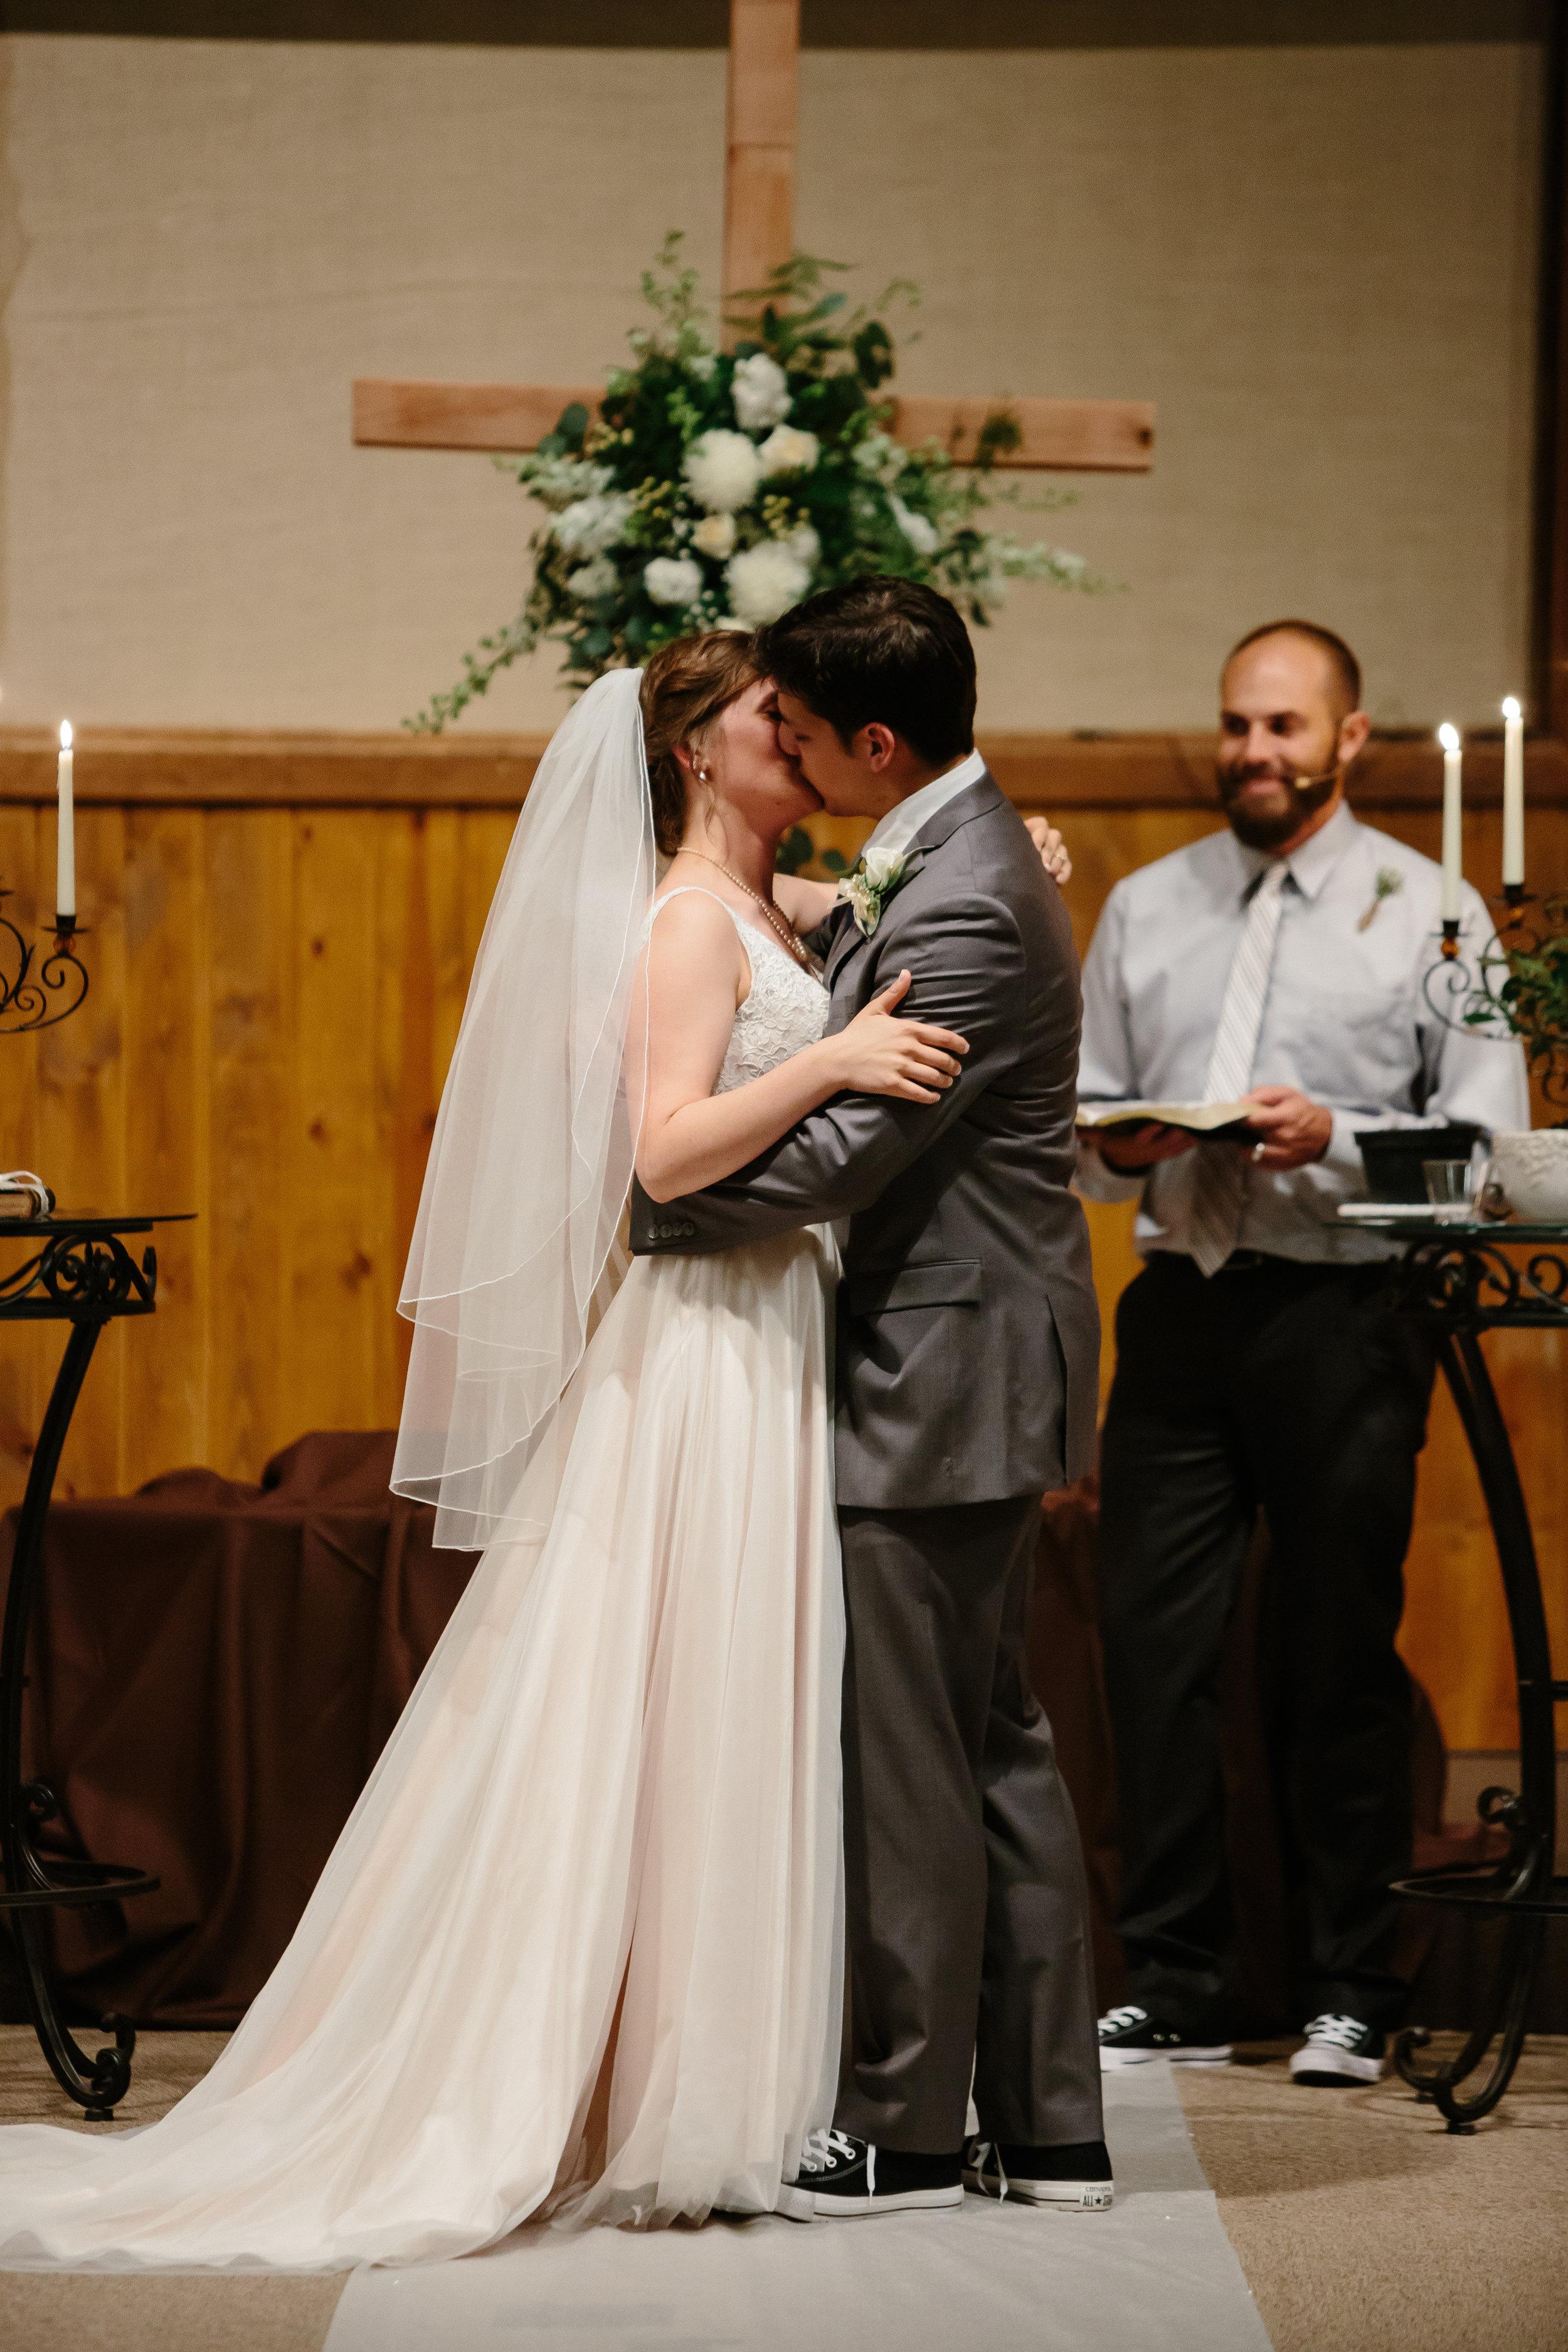 Jordan & Shantel Married - Idaho - Corrie Mick Photography-237.jpg